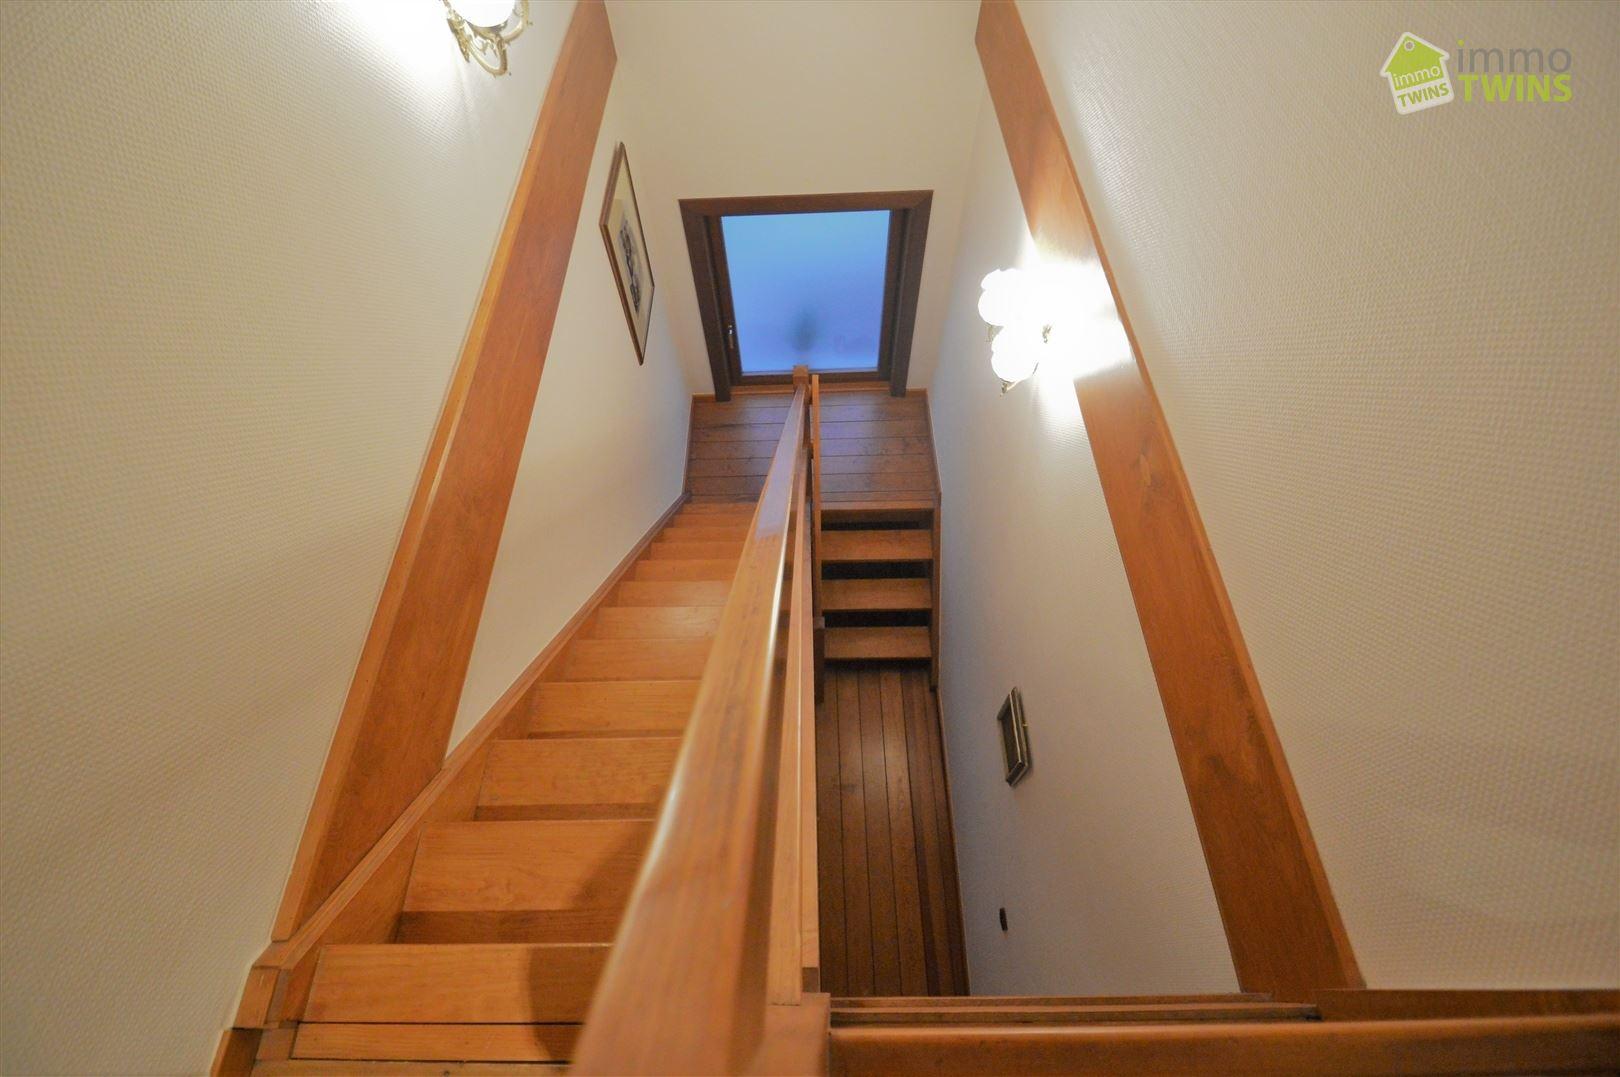 Foto 23 : Duplex/Penthouse te 2890 SINT-AMANDS (België) - Prijs € 449.000